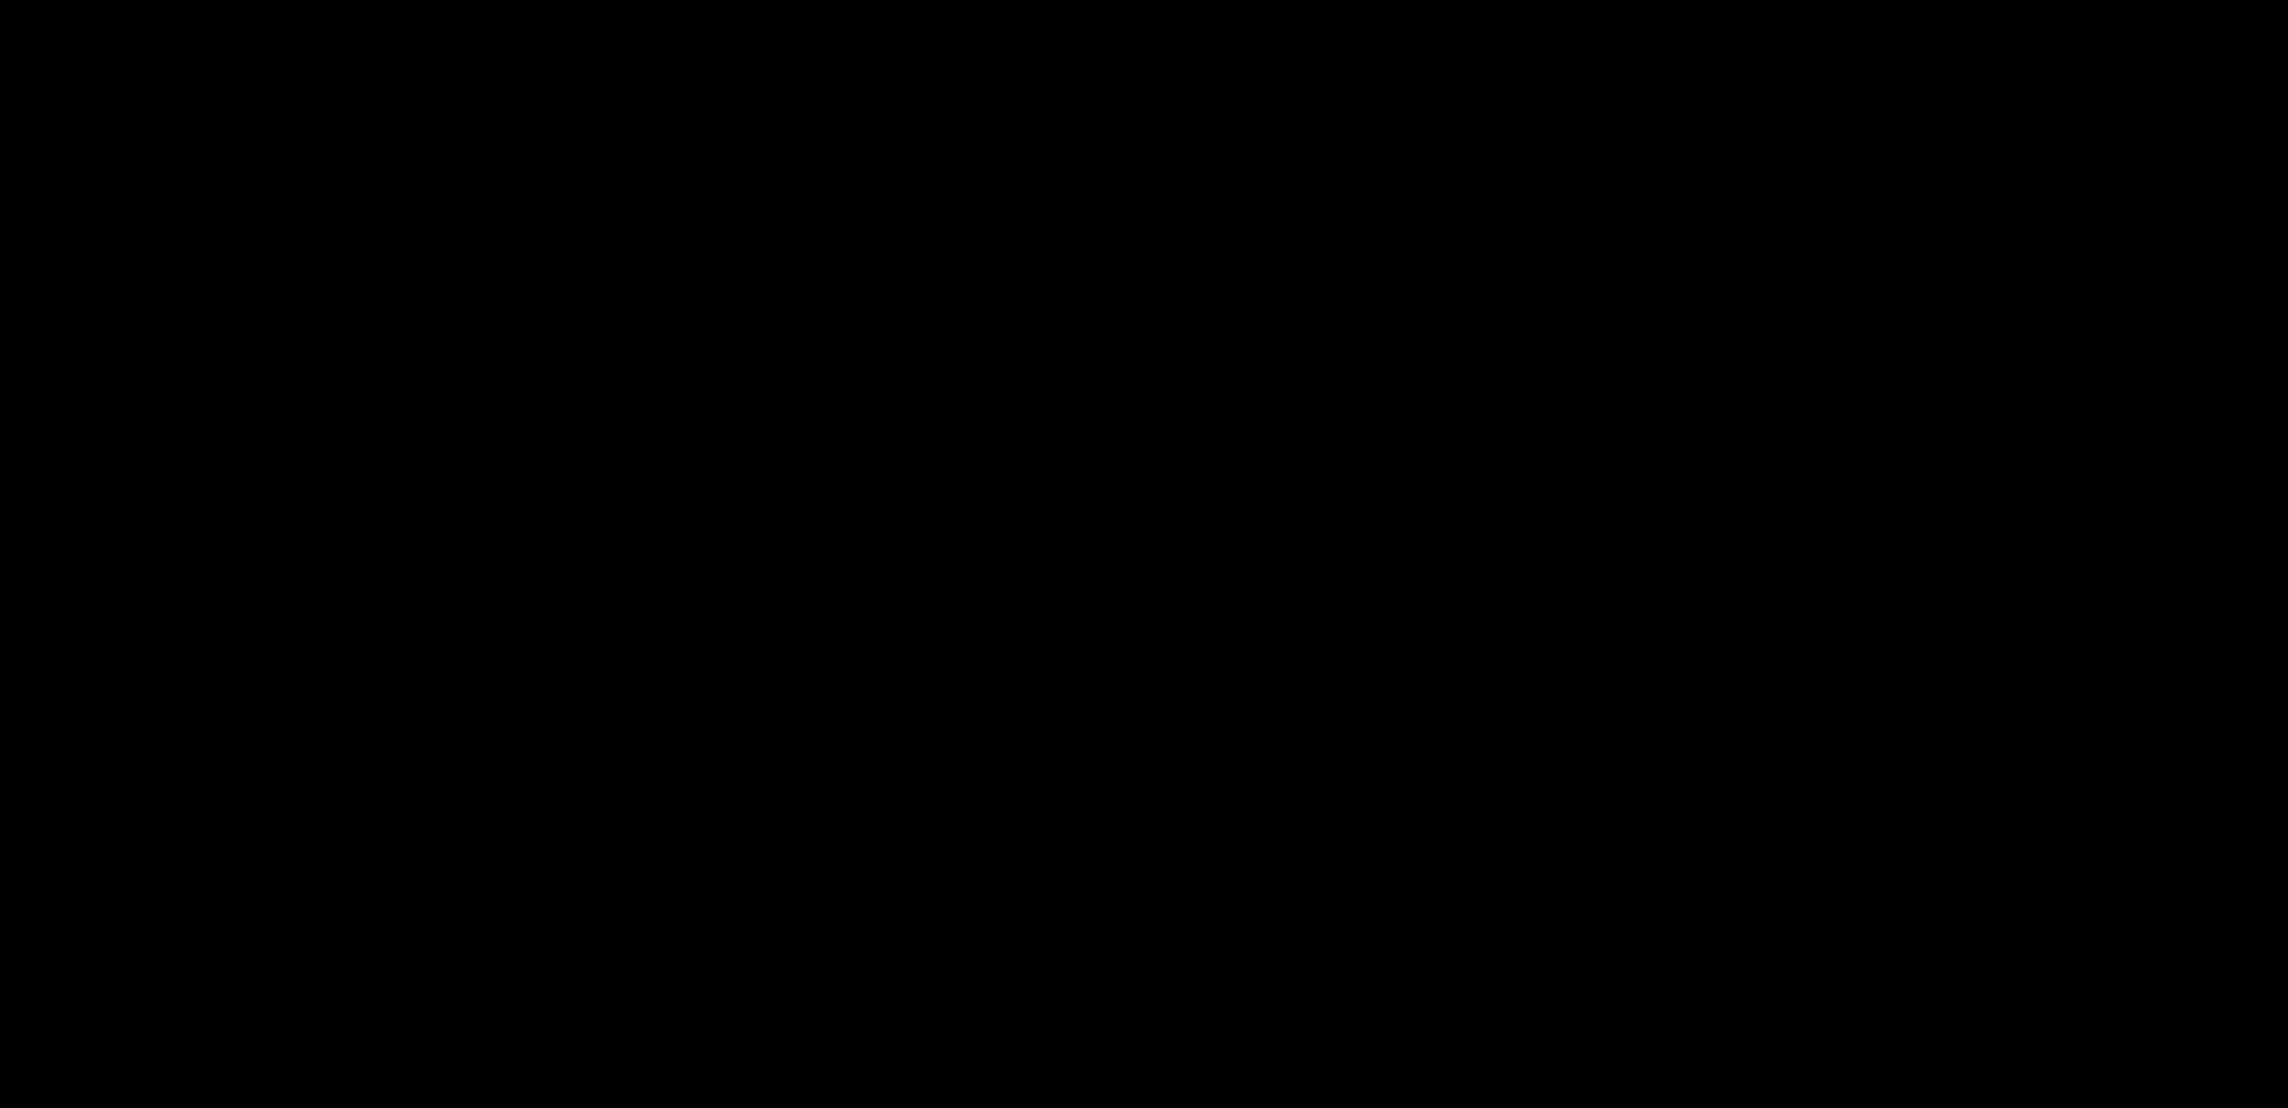 clip art transparent download Slime clipart silhouette. Splat nicholasjudy big image